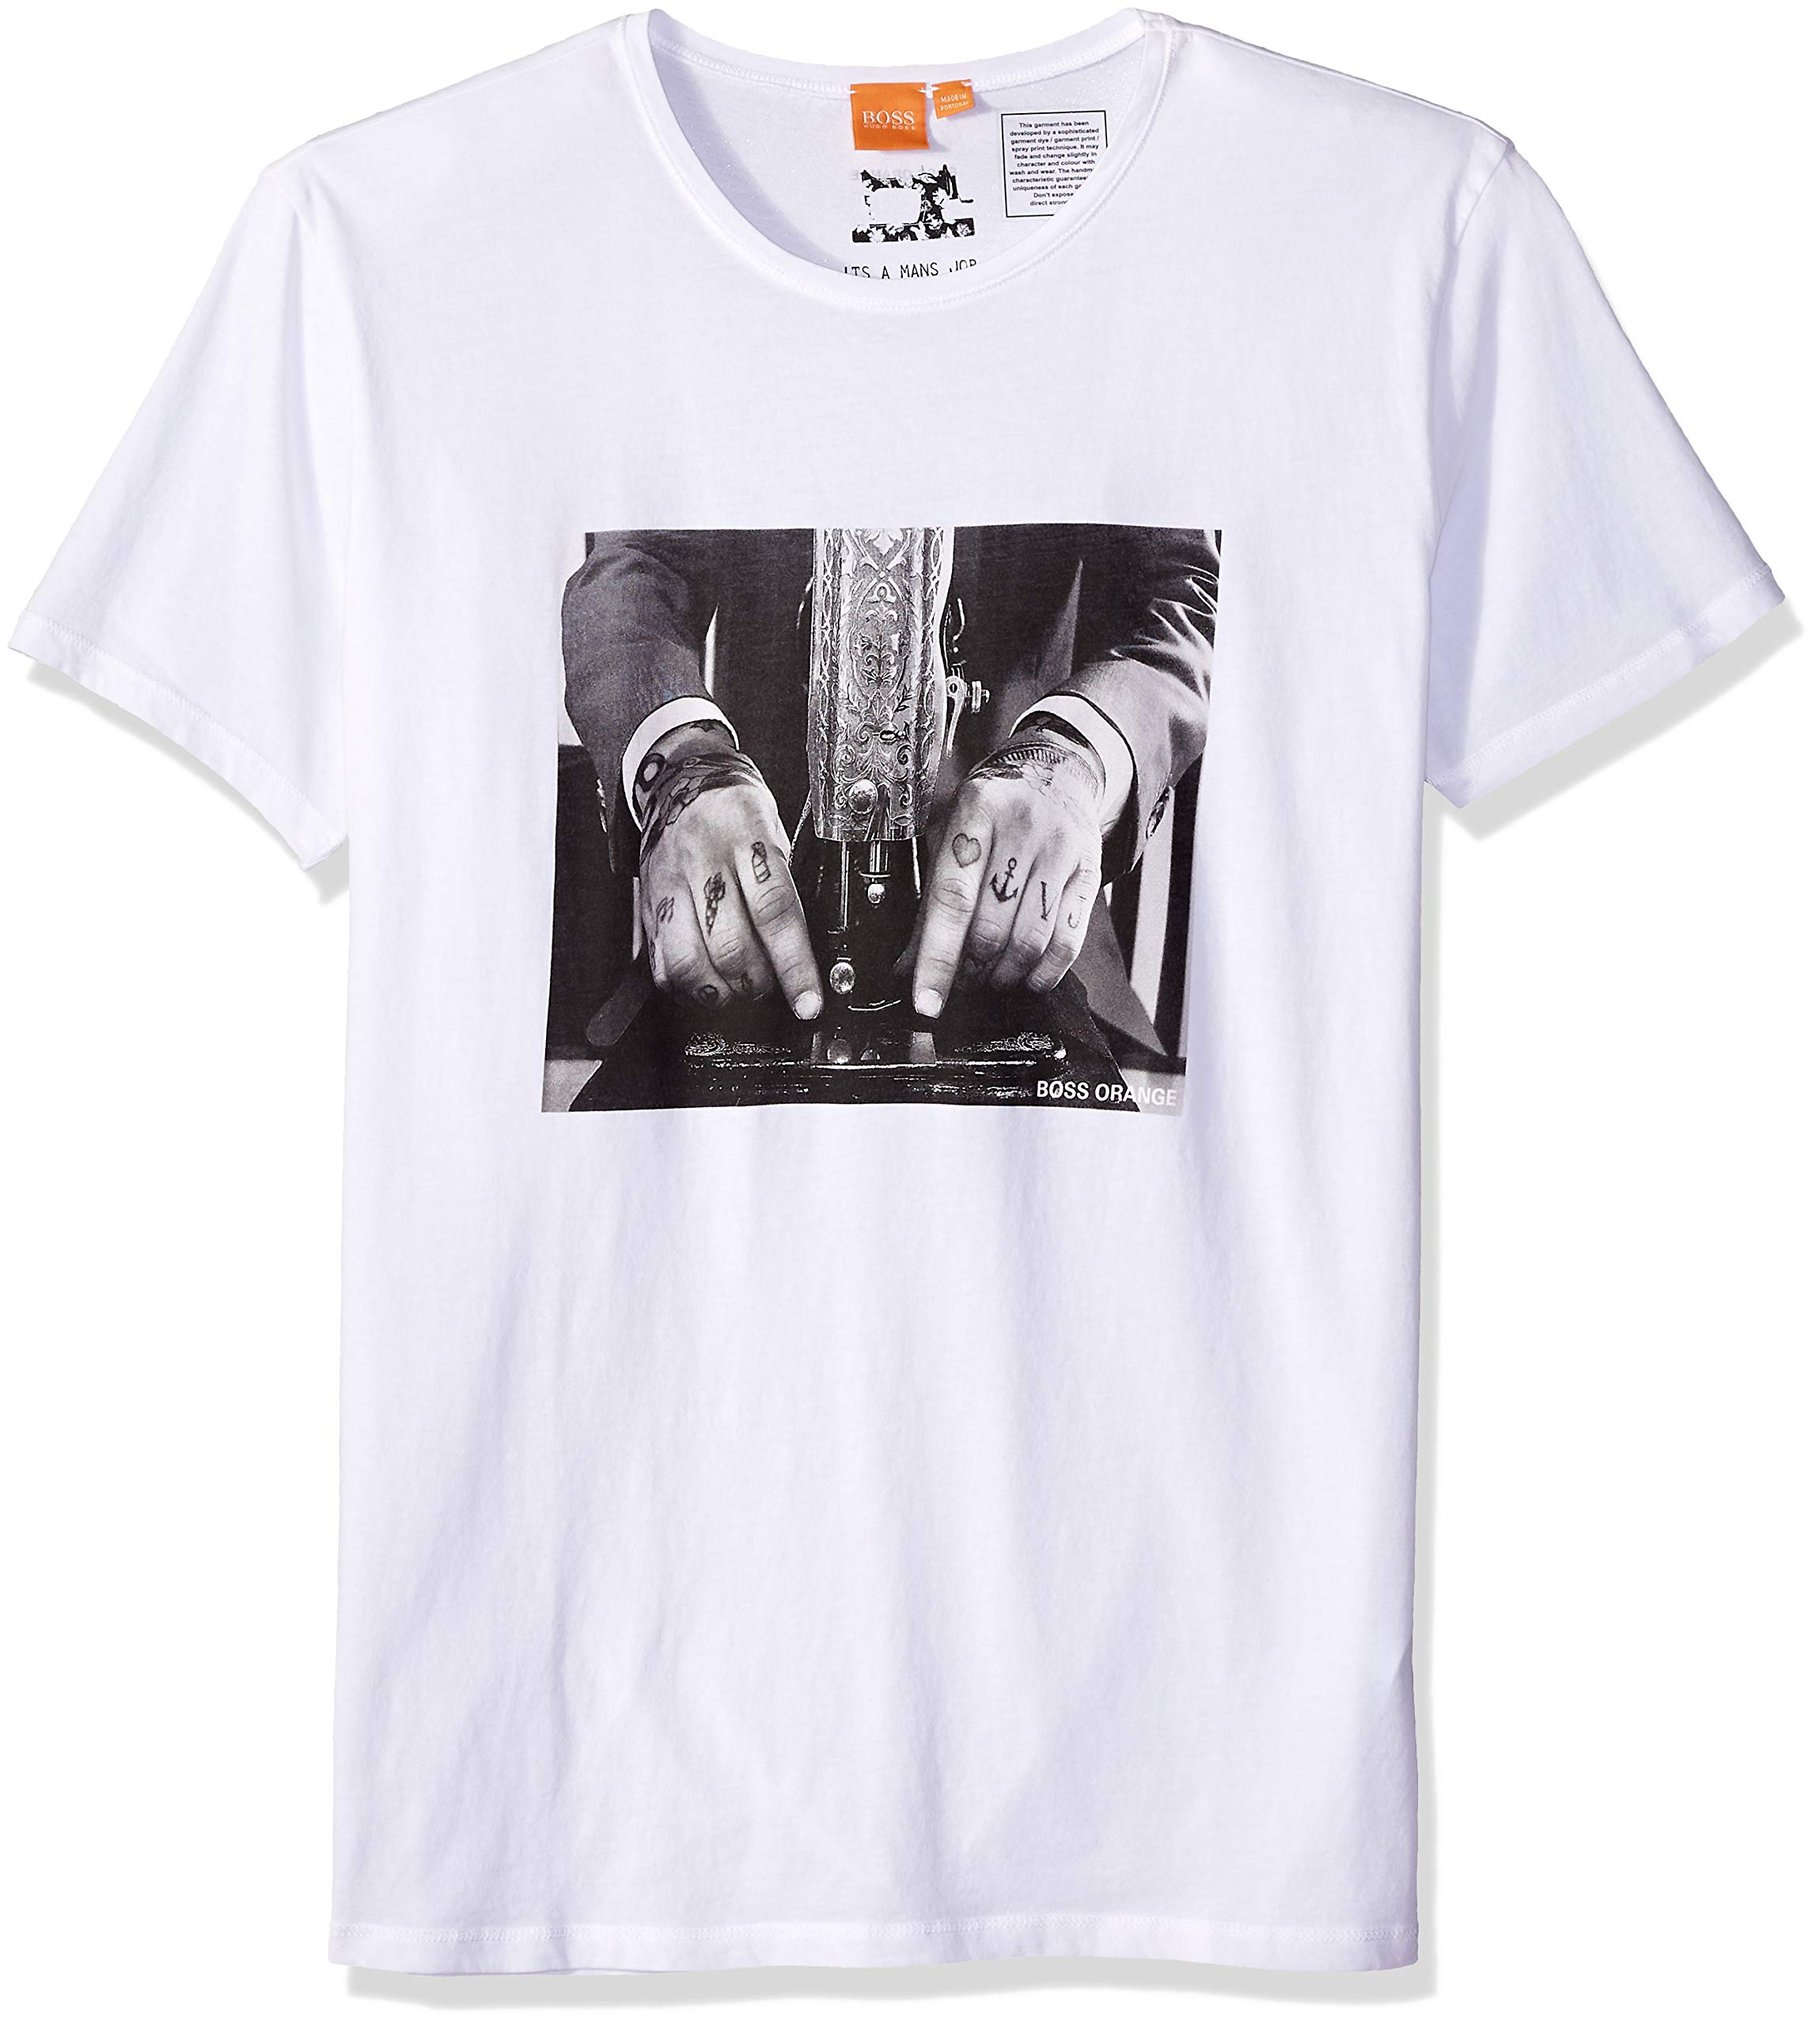 BOSS Orange Men's Taboo3 Printed T-Shirt, White, XL